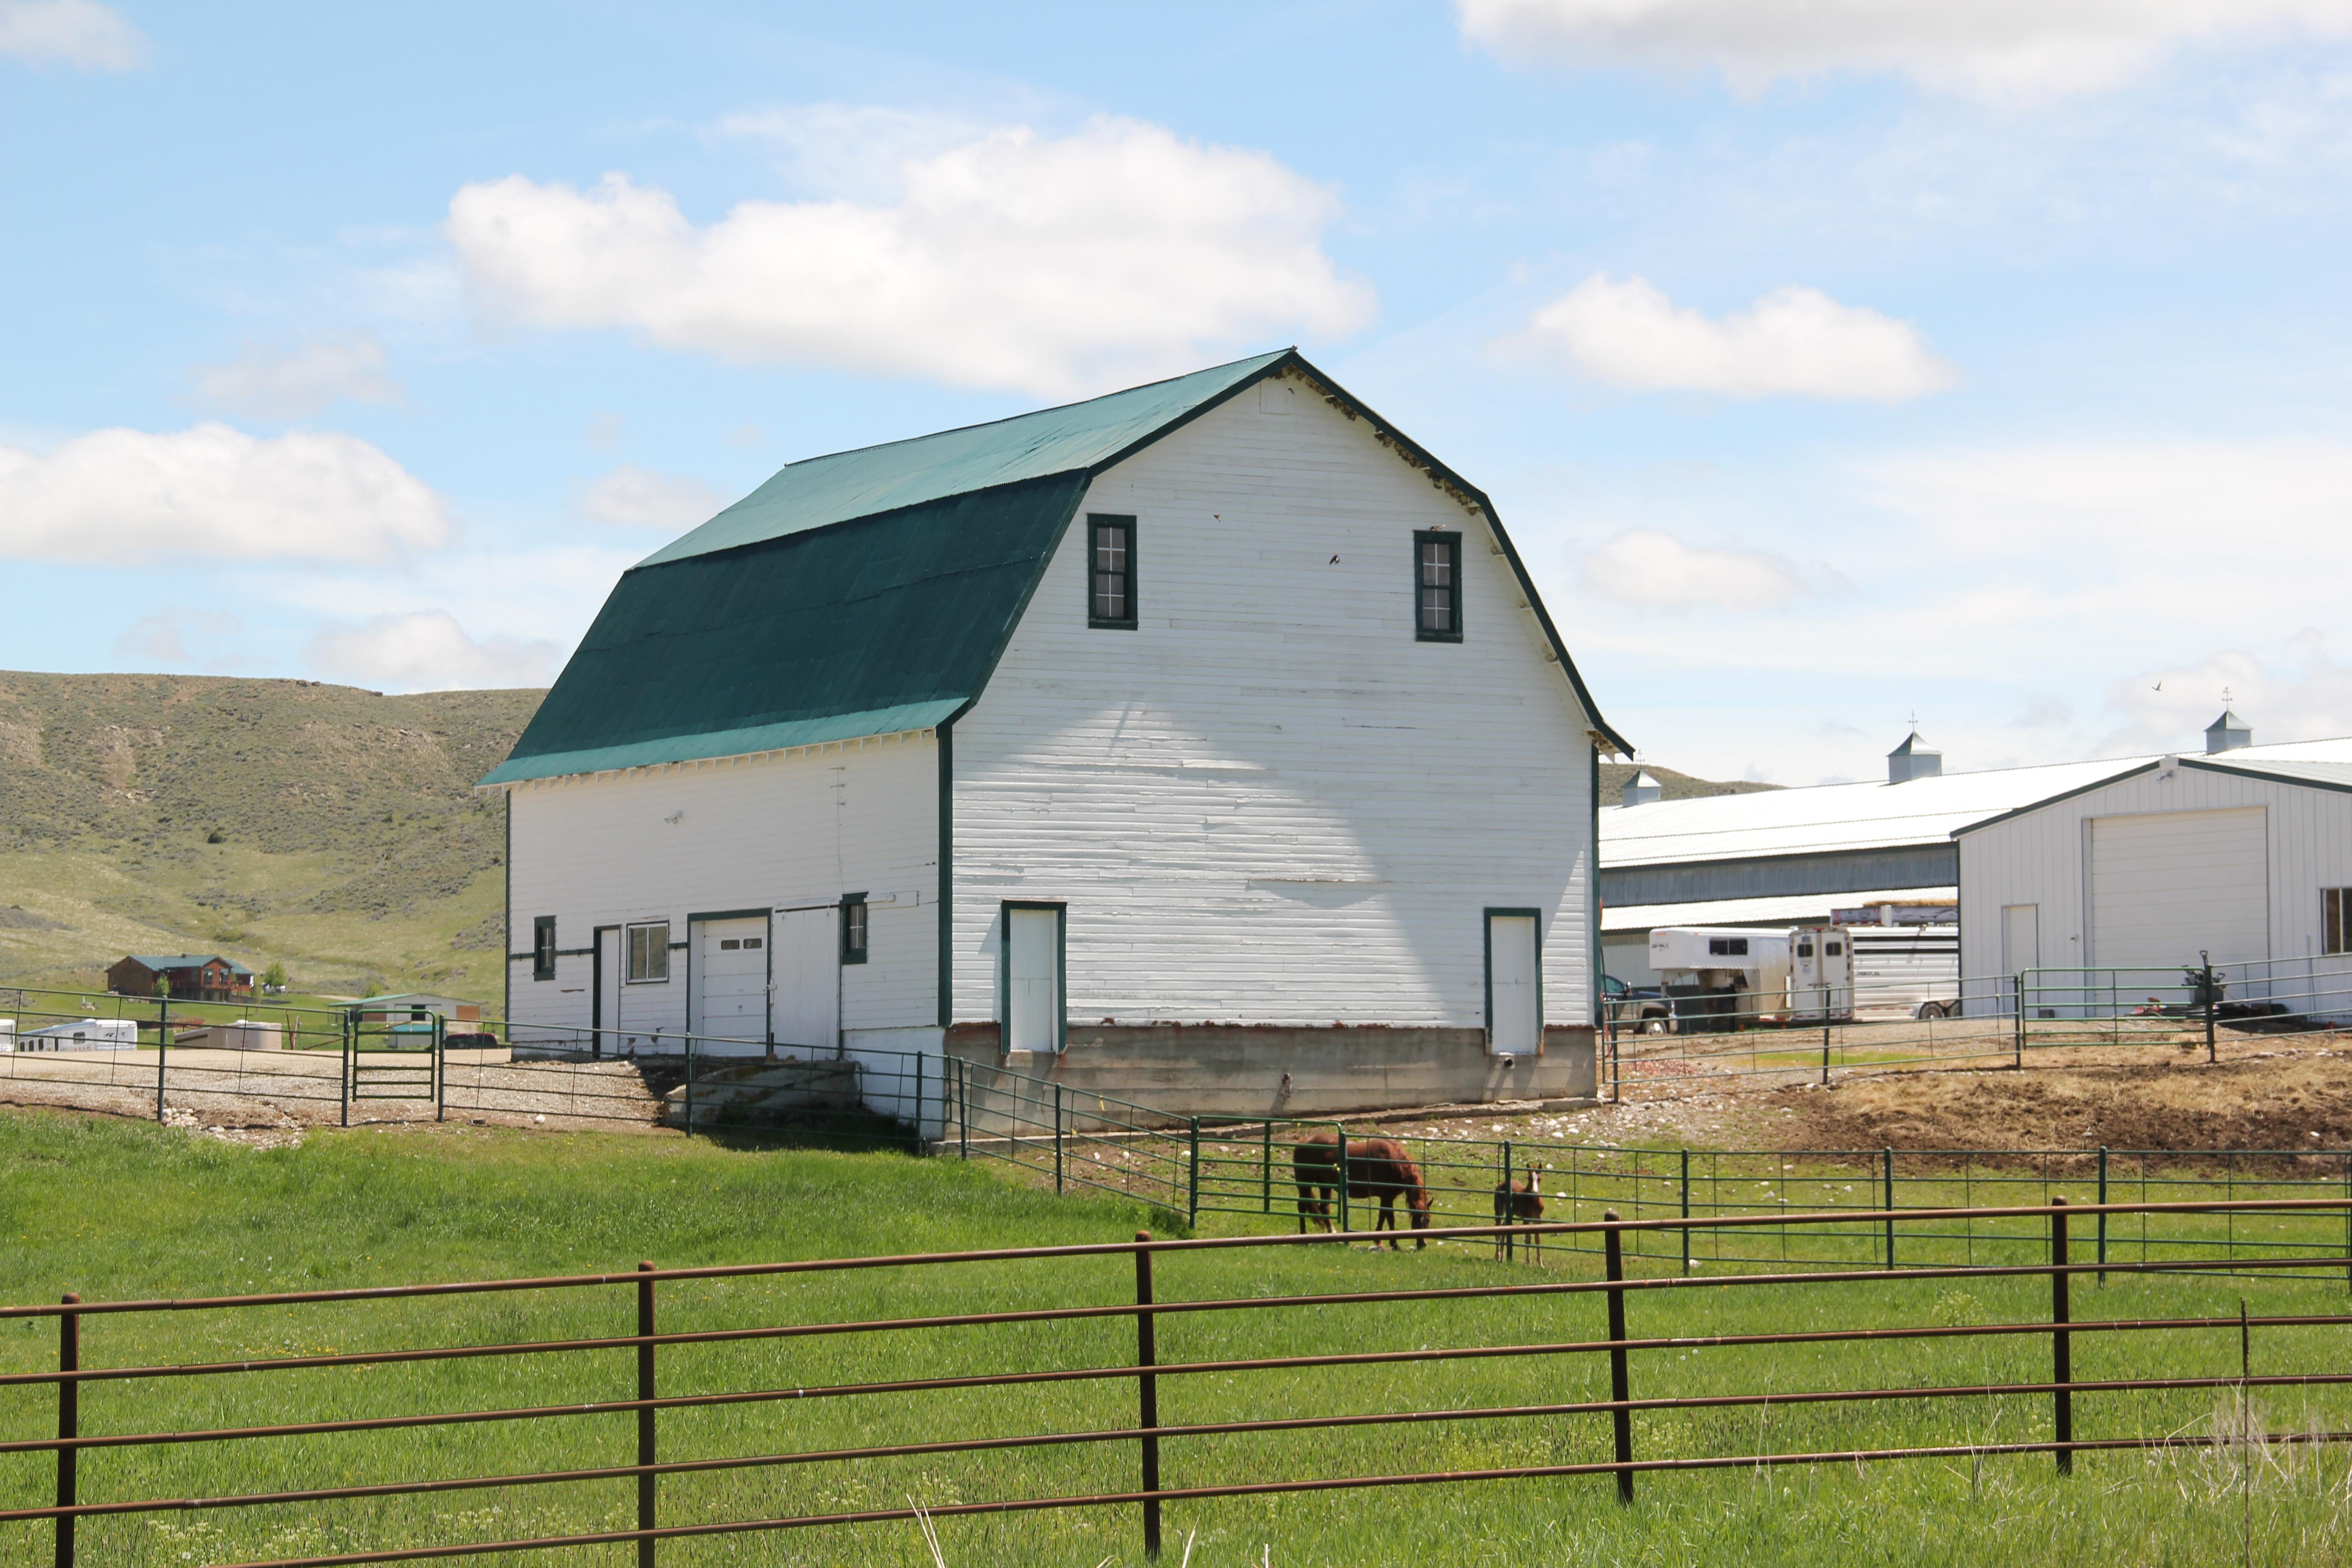 montana historic barns revisiting montana s historic landscape gambrel roof barn near fishtail highway 78